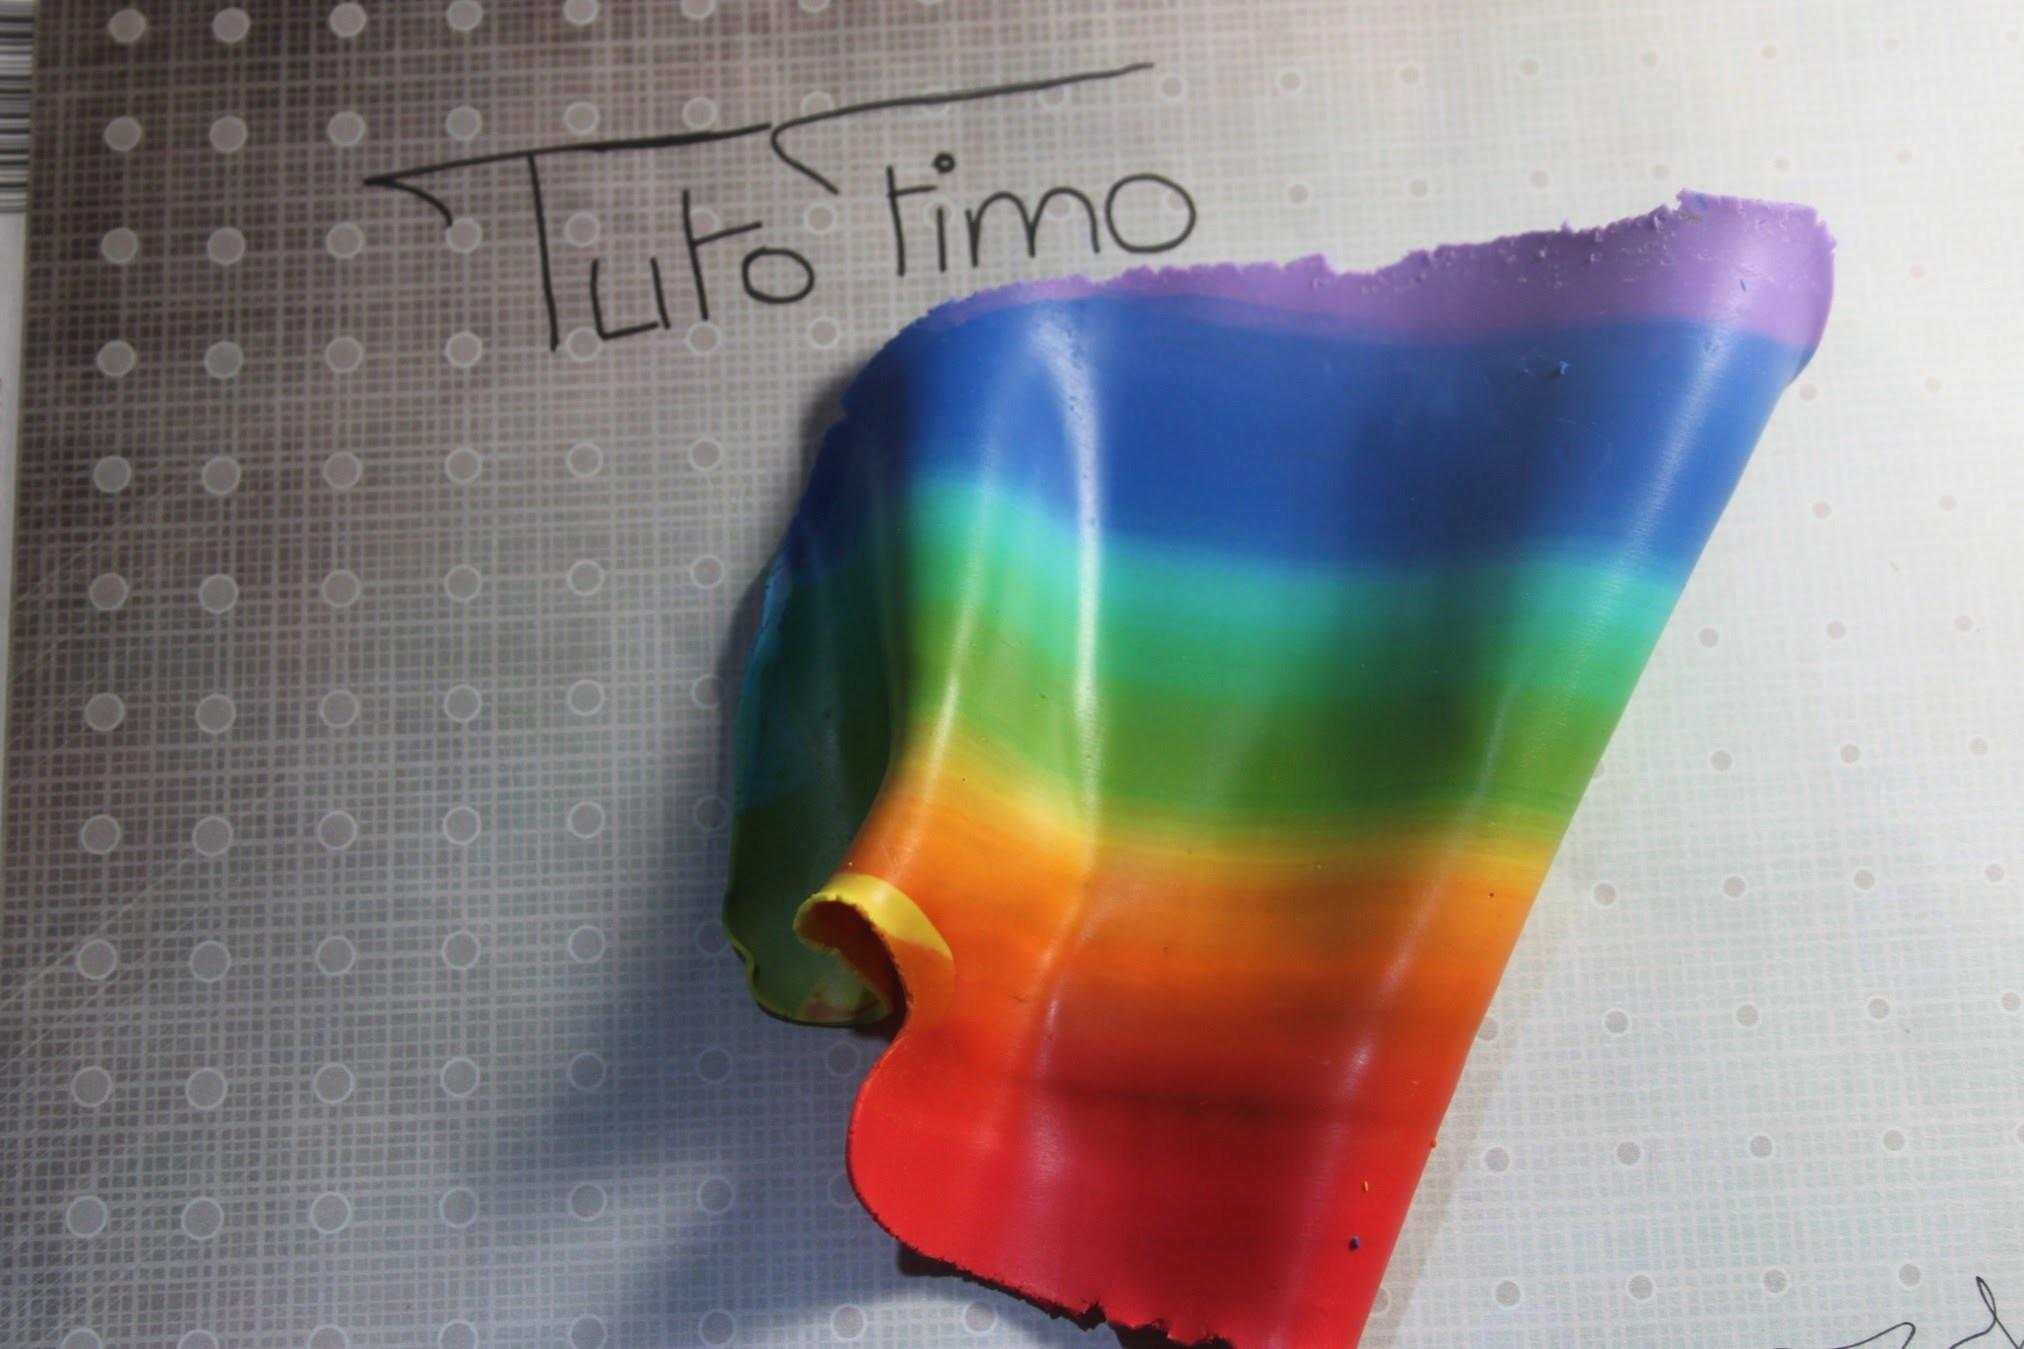 [♥✿ Tuto Fimo : Dégradé arc en ciel ✿♥] ~ [♥✿ Polymer Clay Tutorial : gradient rainbow ✿♥]